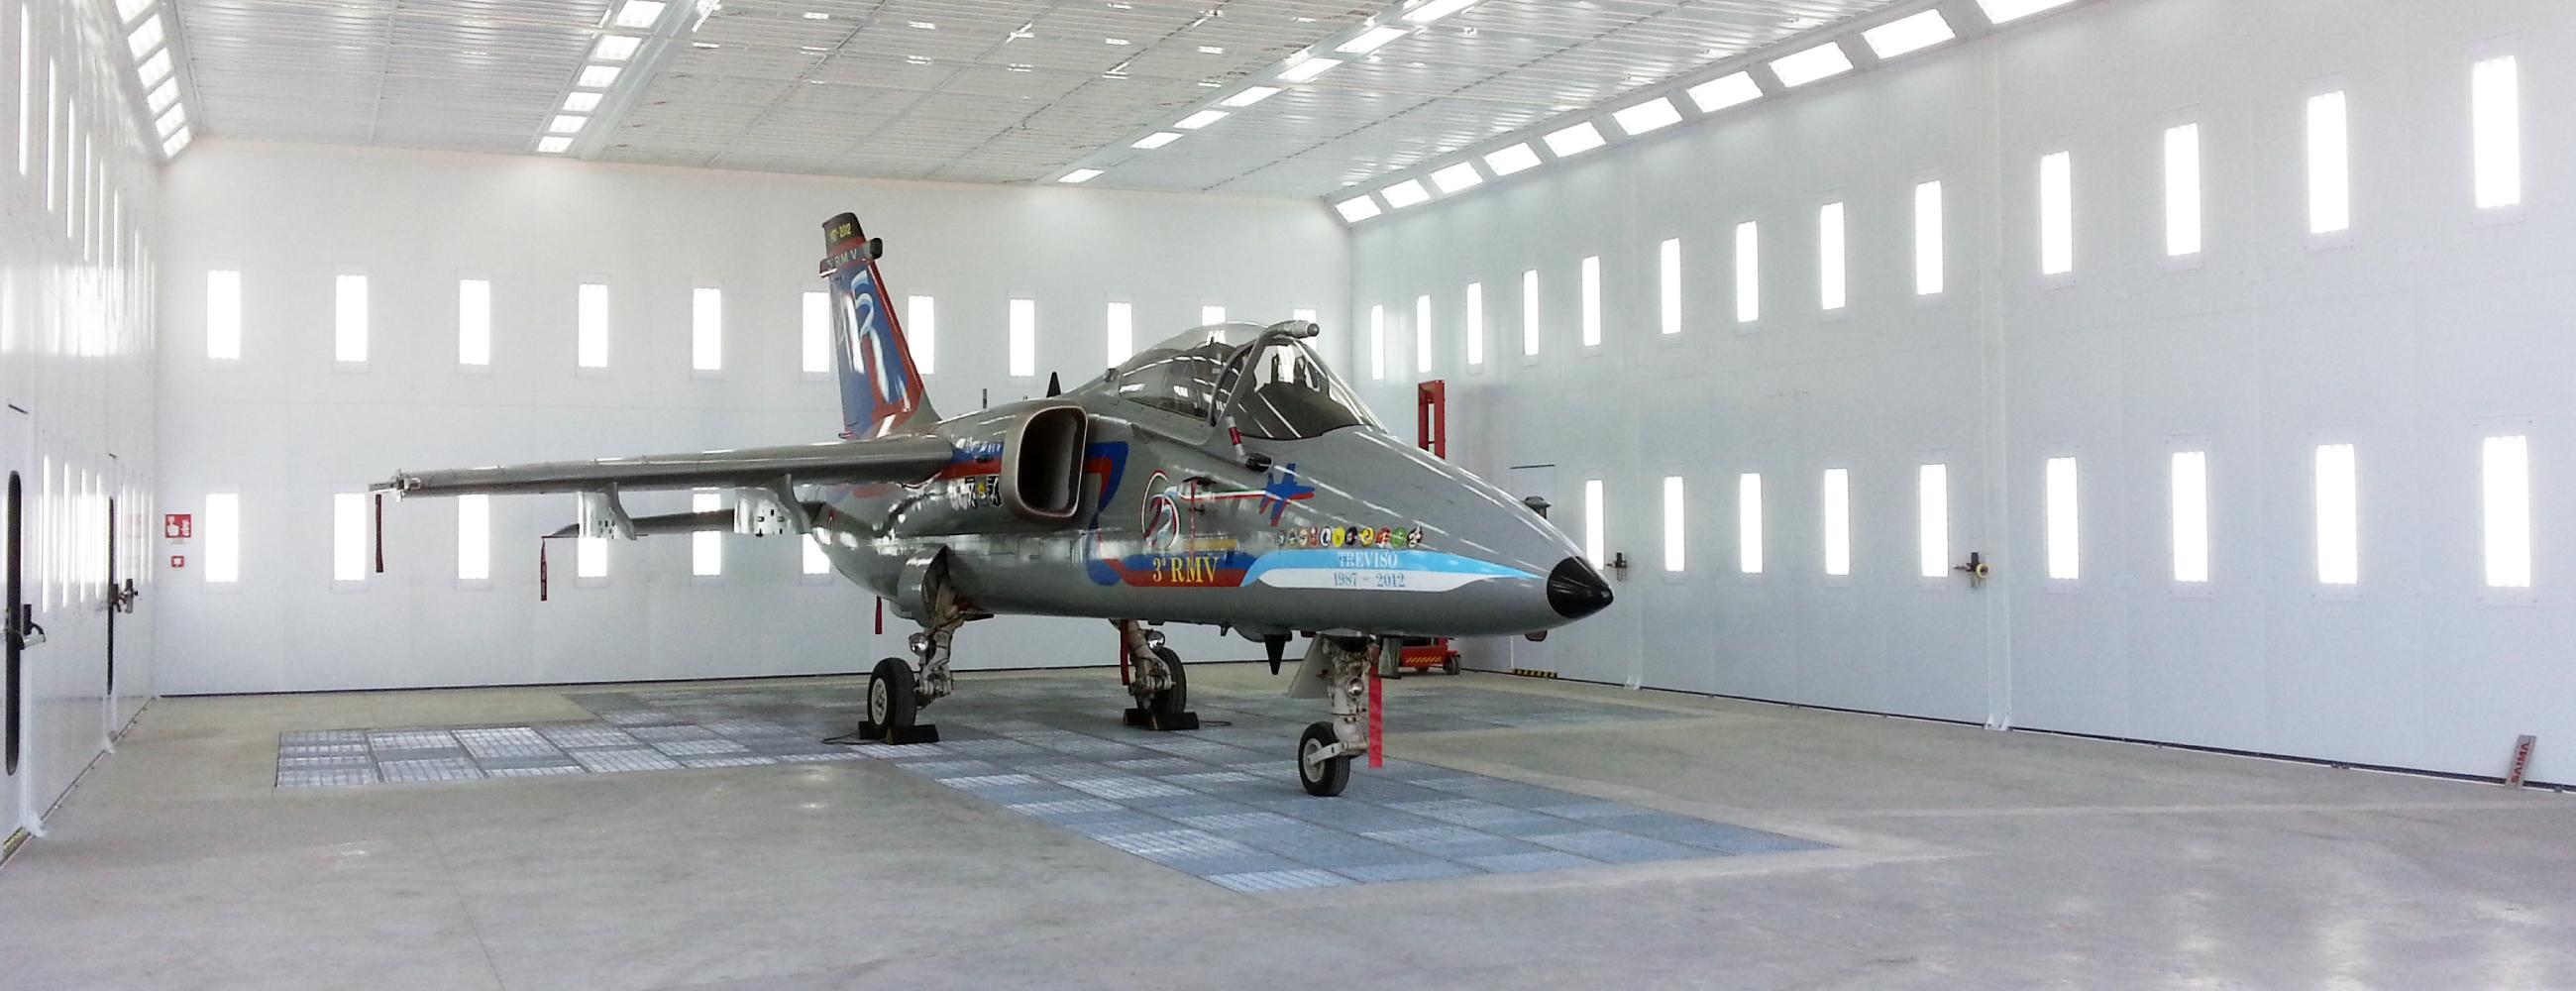 Aircraft-Hanger-Paint-Booth